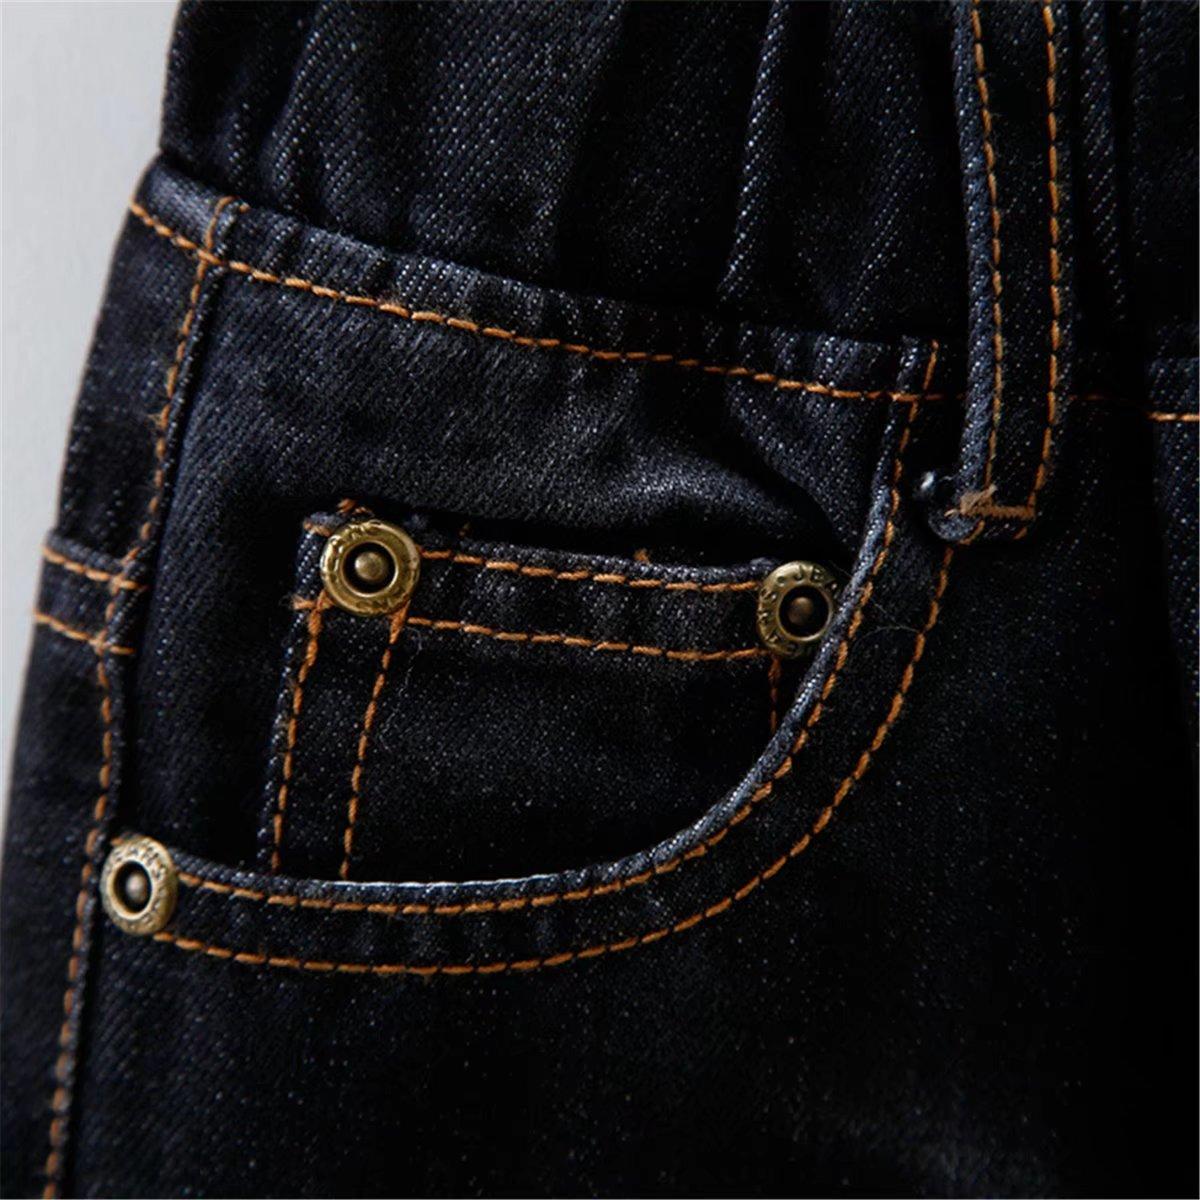 Ameyda Unisex Kids Baby Ripped Holes Jeans Washed Denim Pants